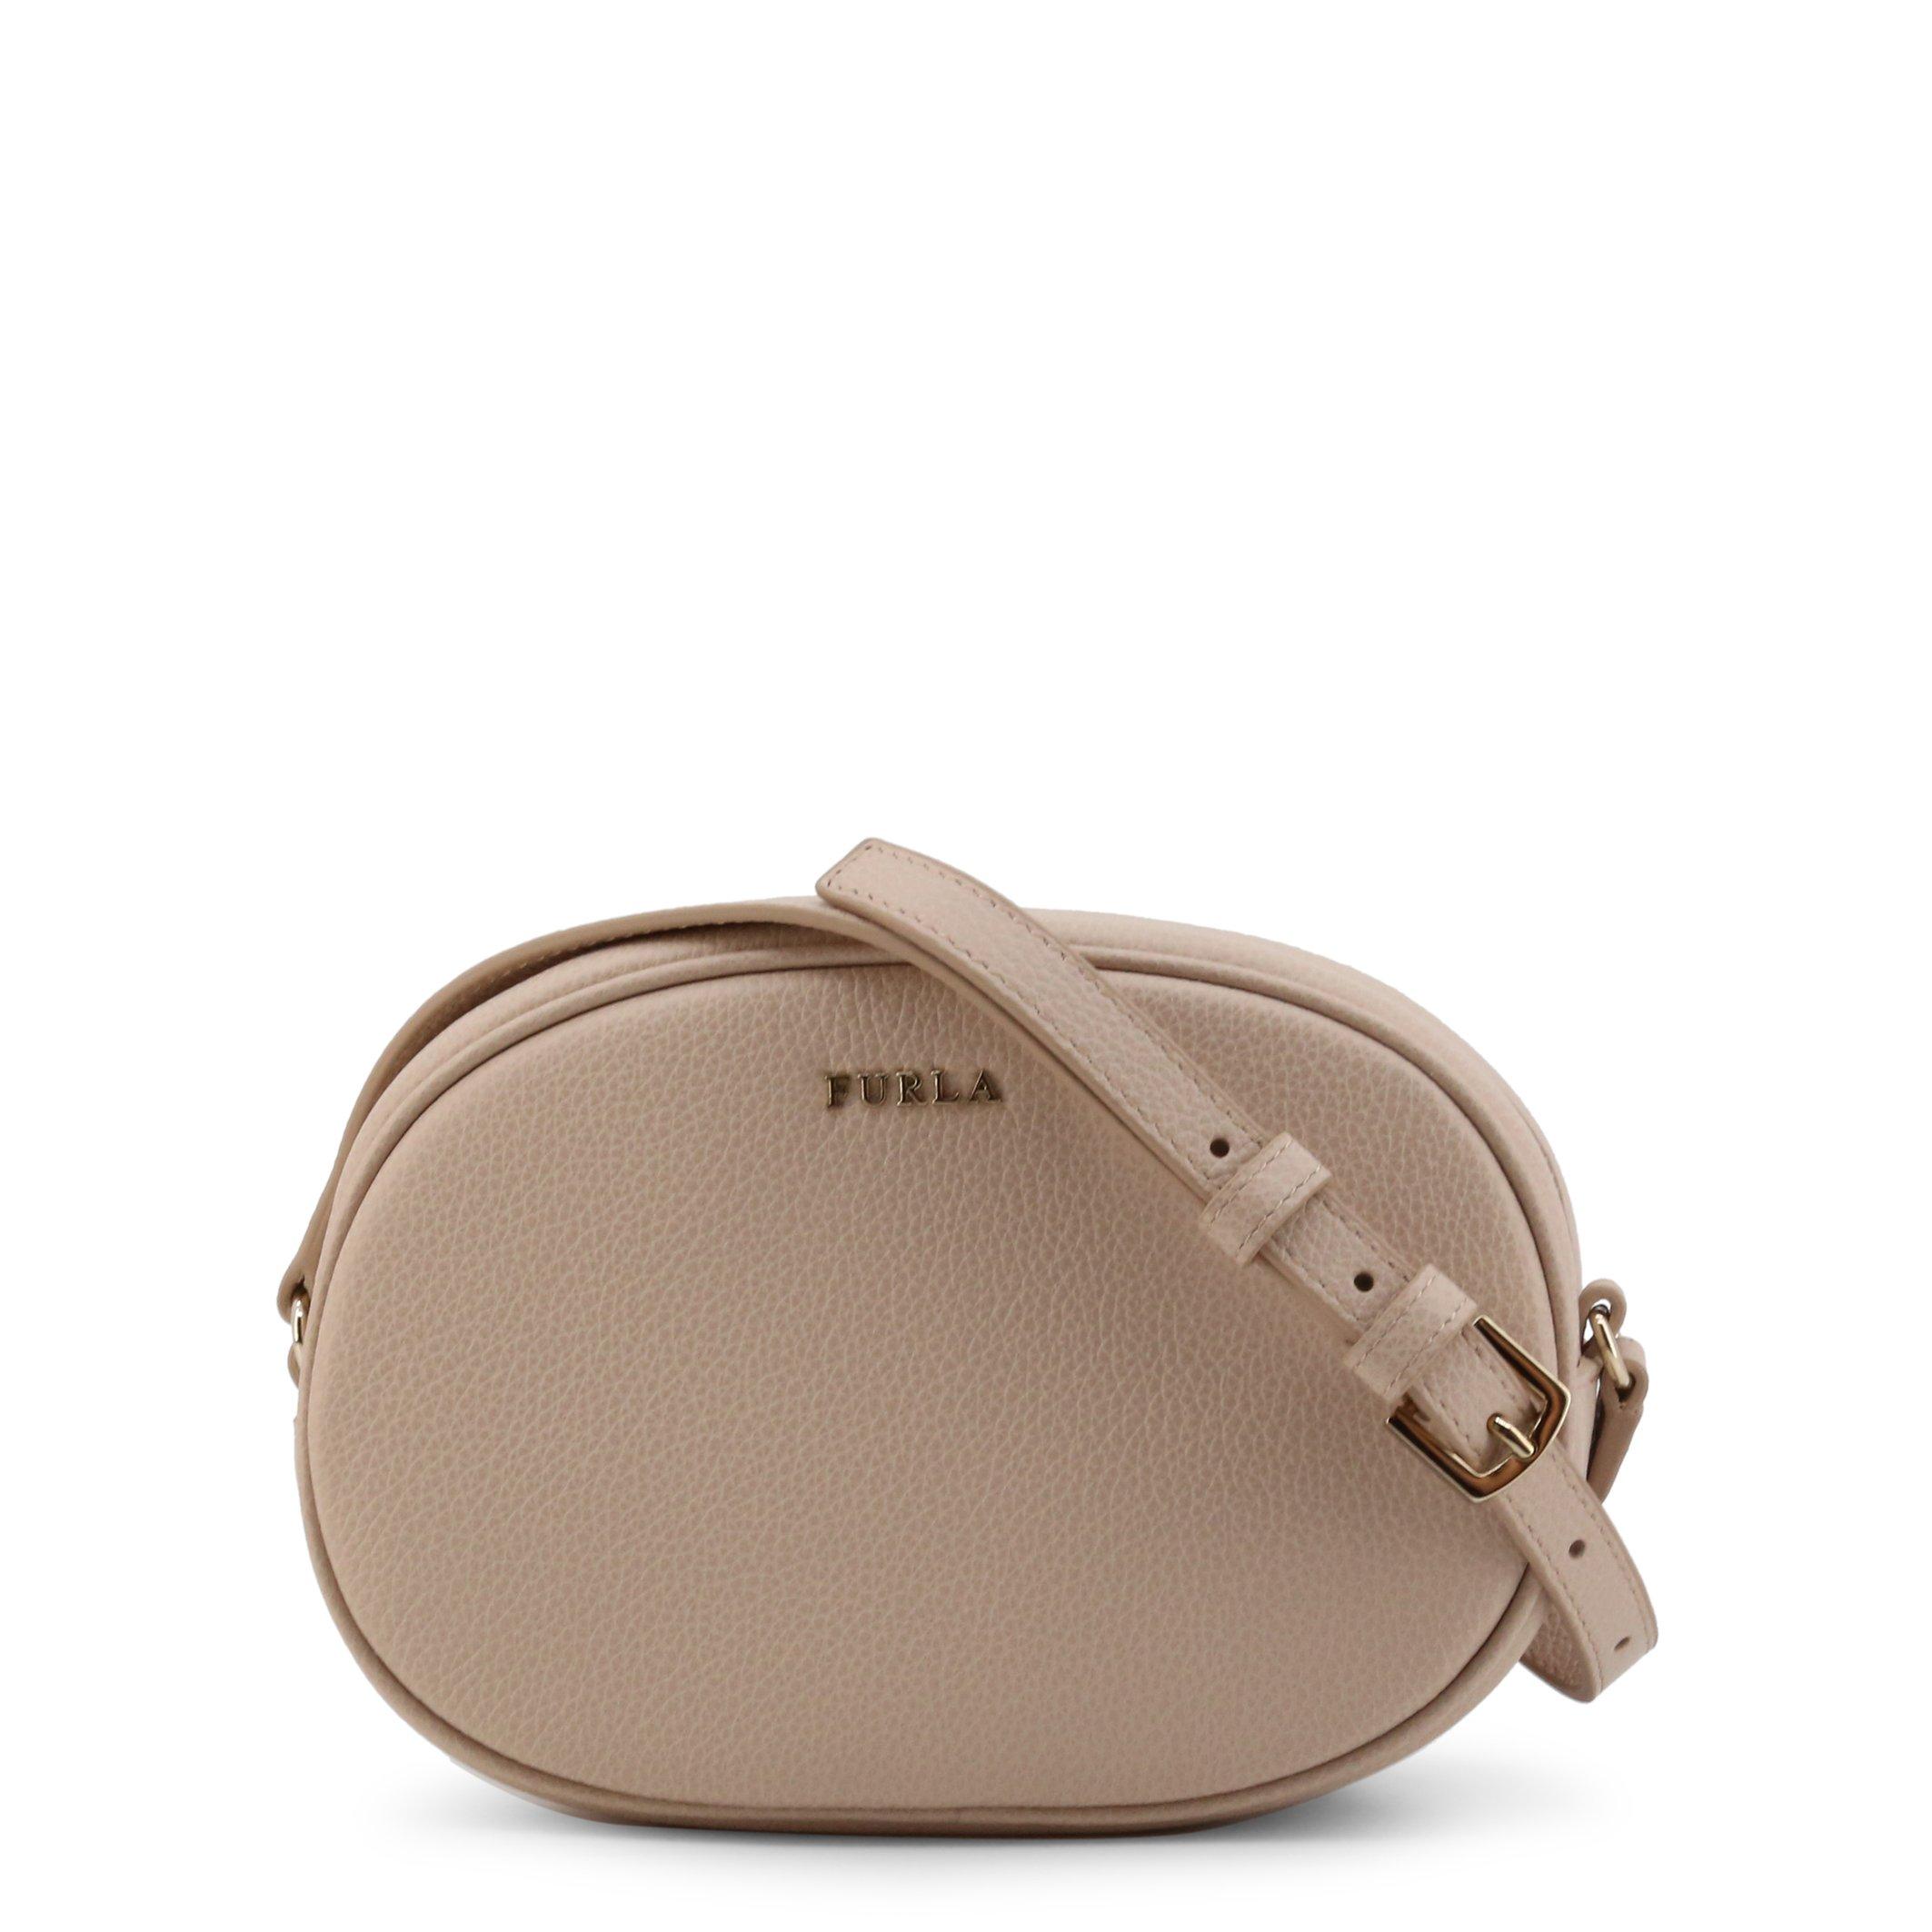 Furla Women's Crossbody Bag Various Colours CARA_EAU2CRA - brown NOSIZE